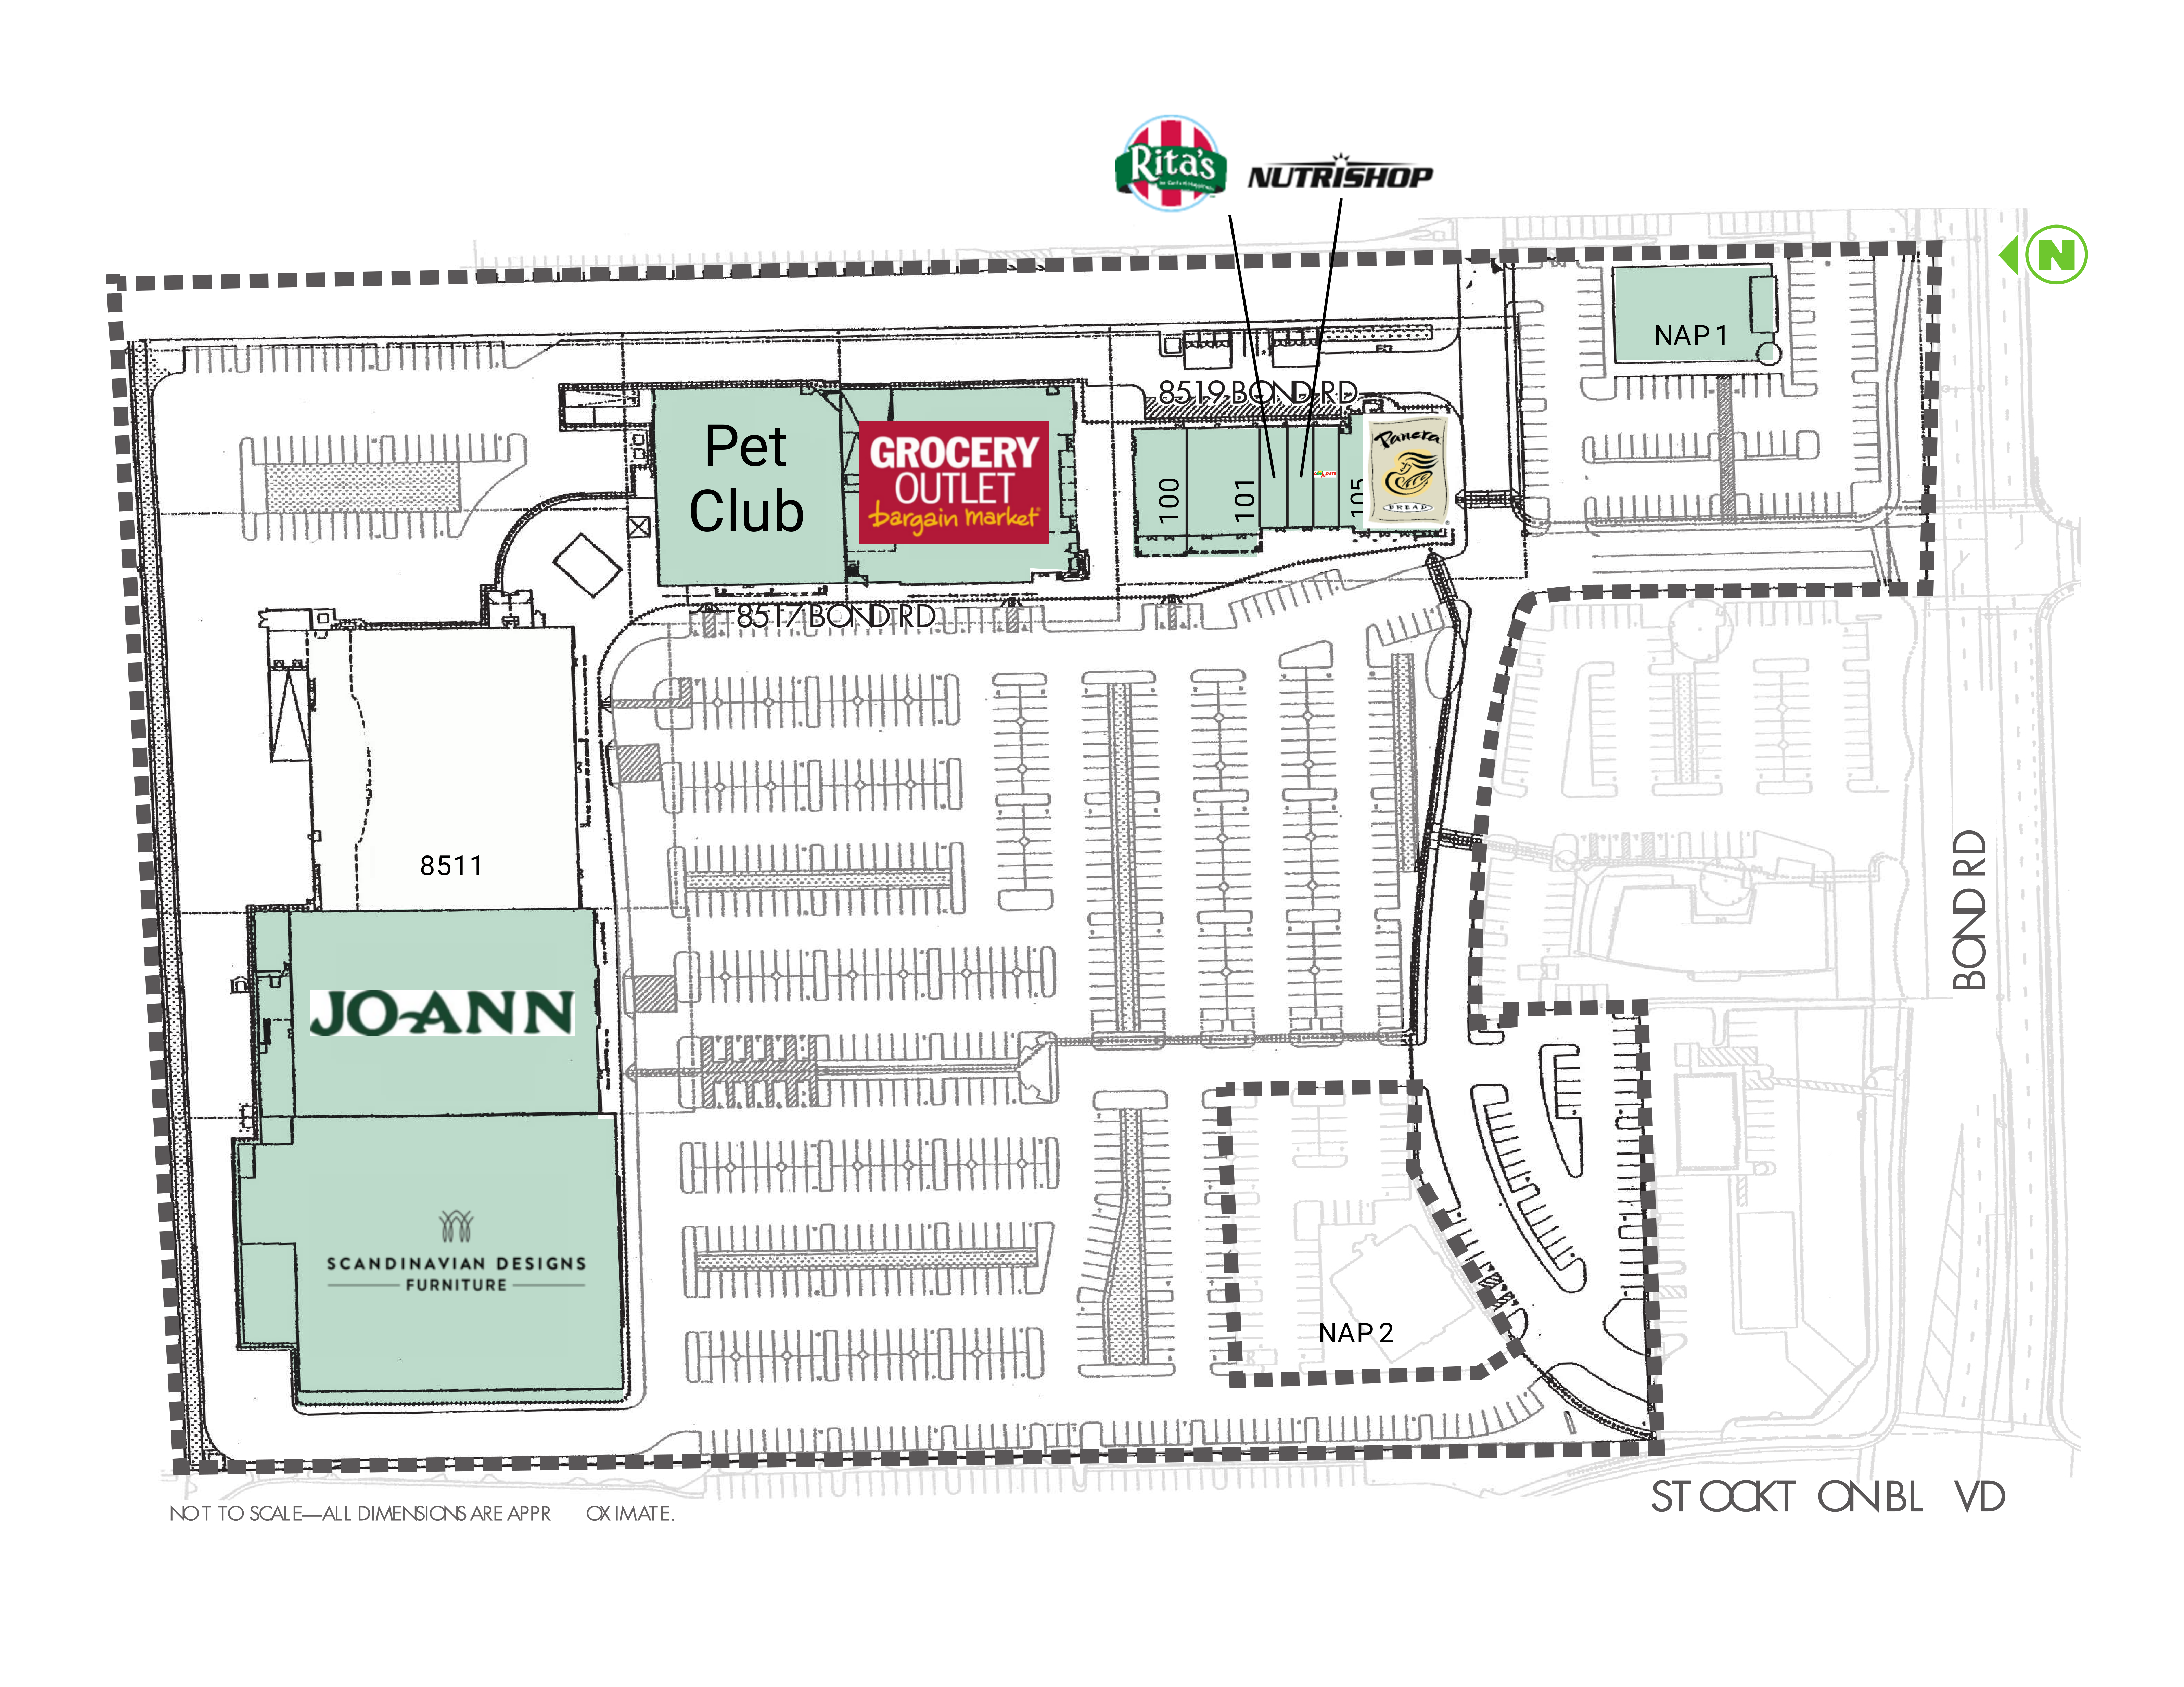 Elk Grove Marketplace: site plan